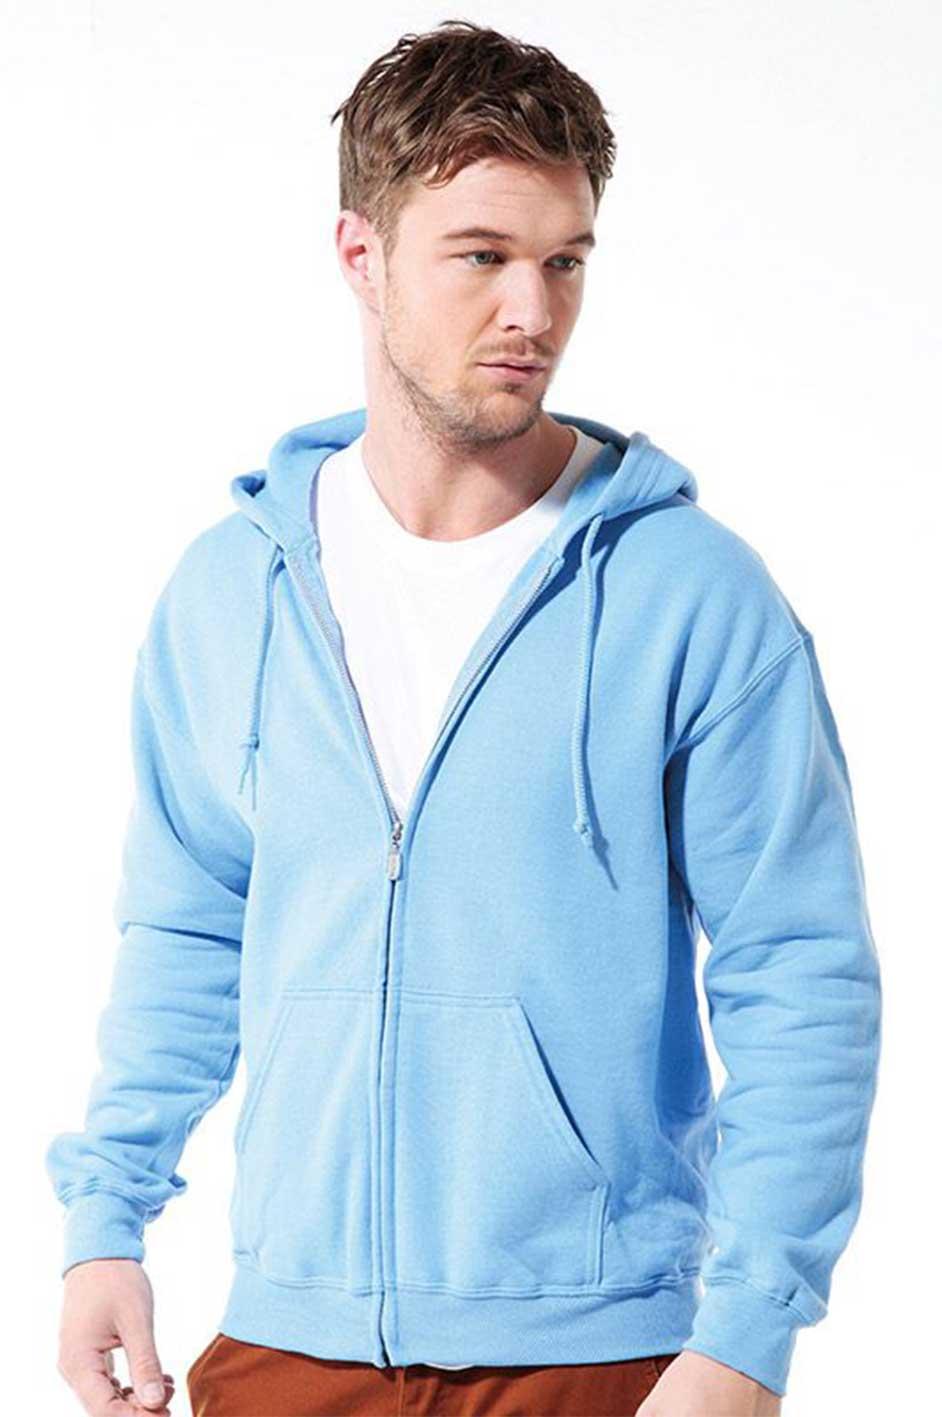 Gildan Heavy Blend Zipped Hoodies